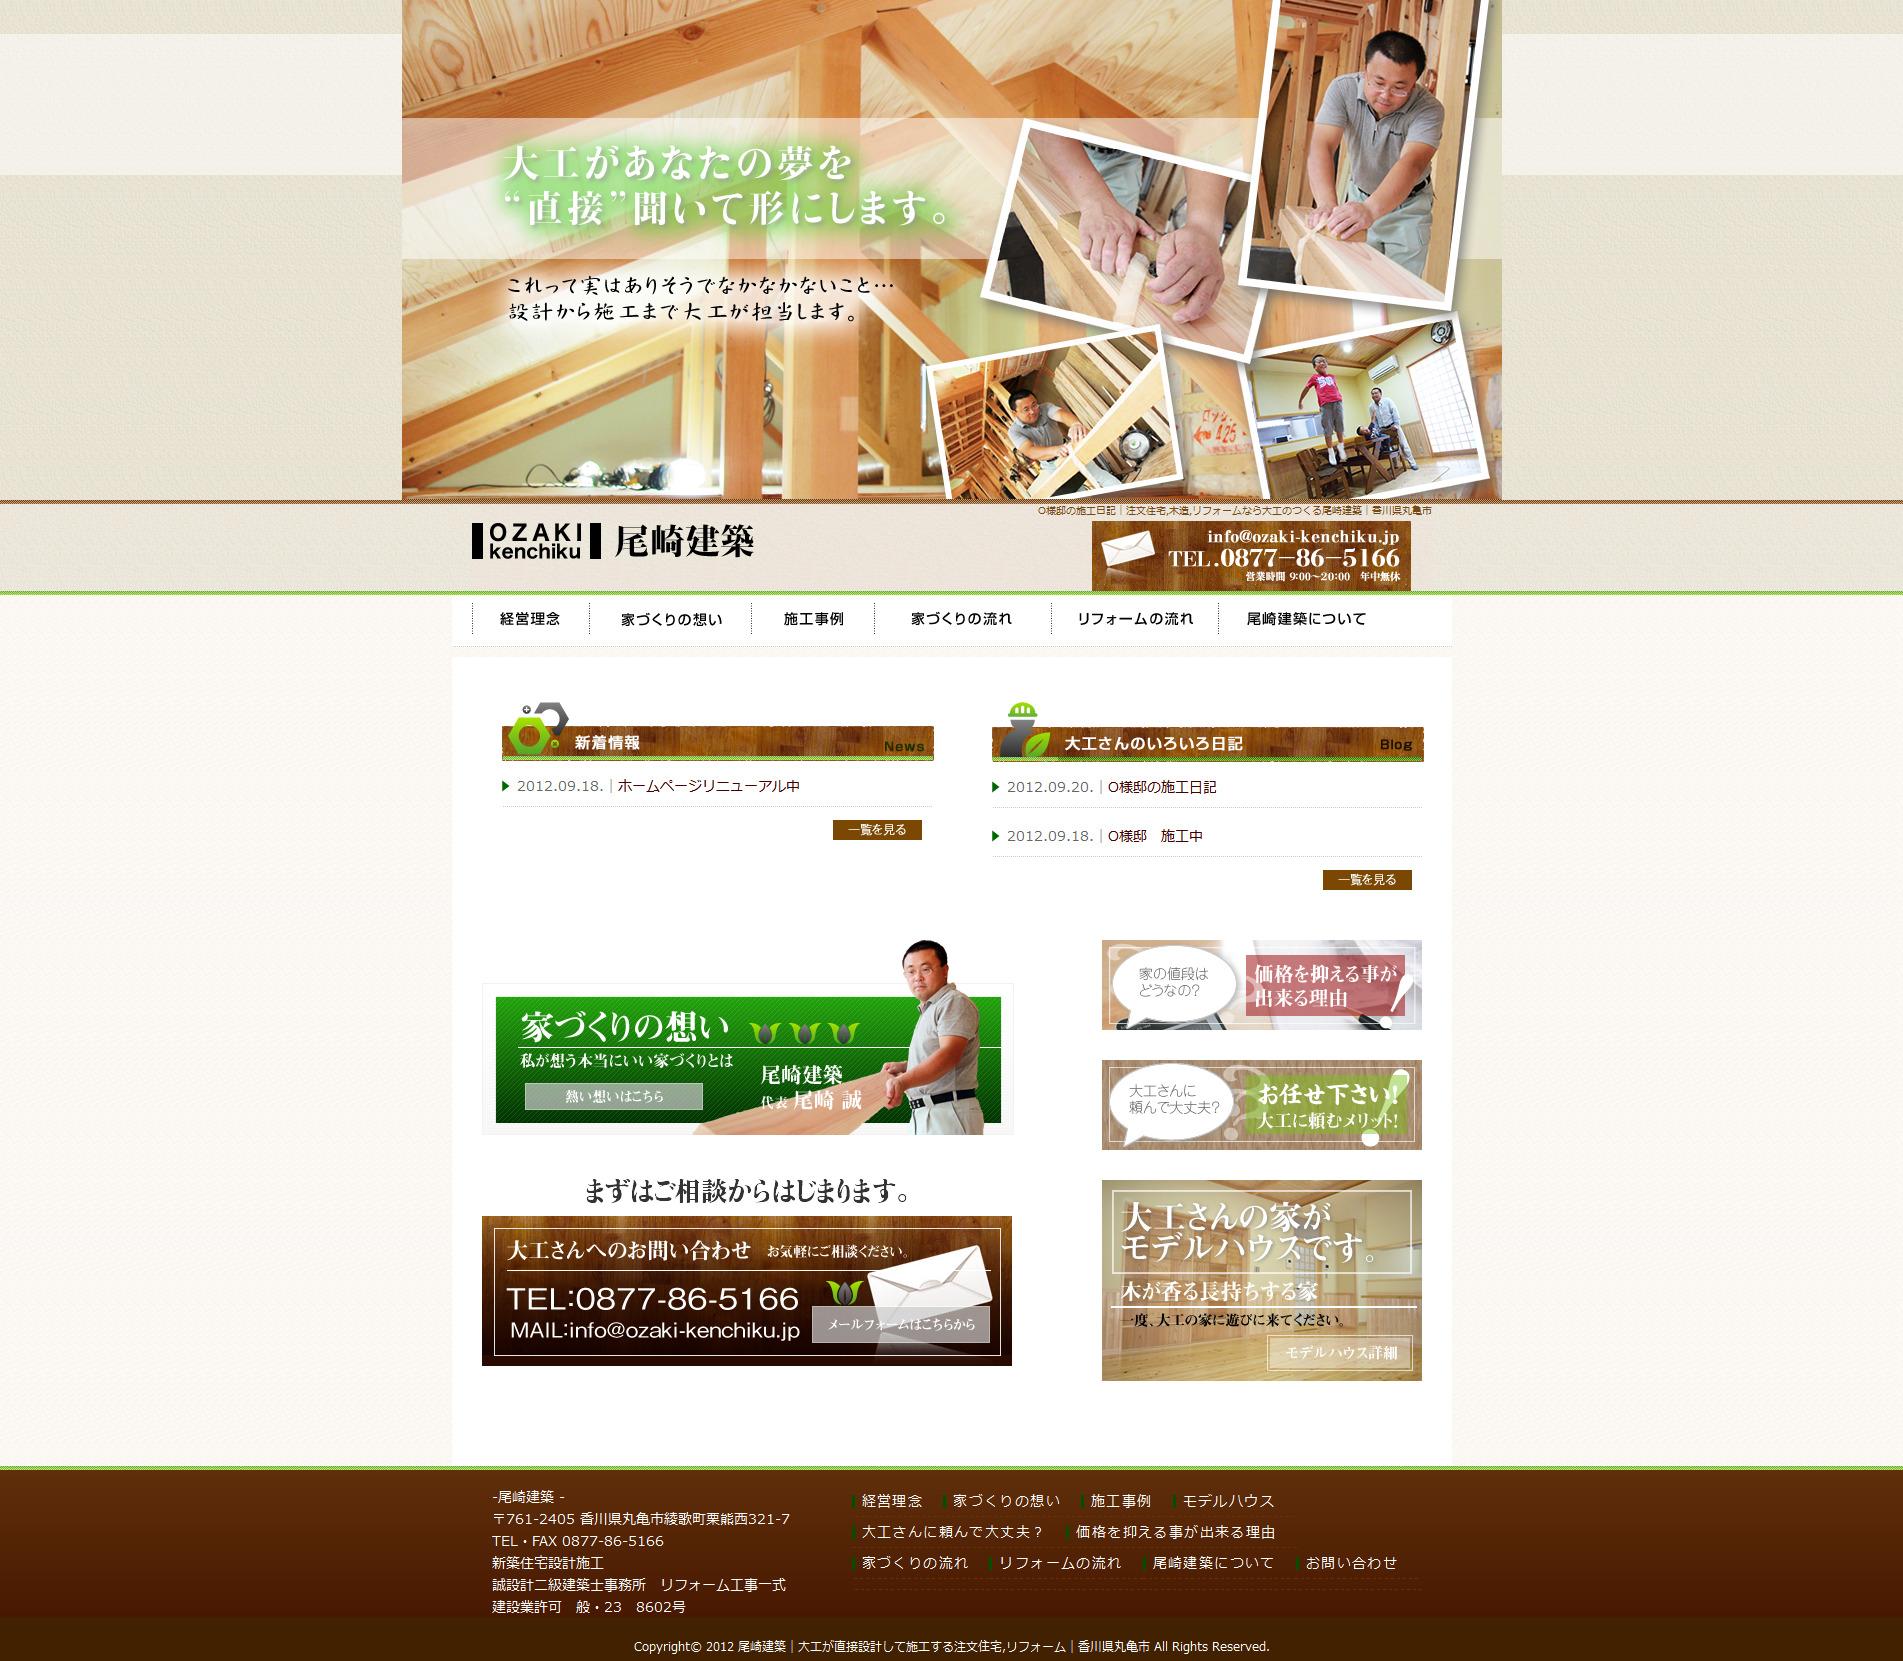 【WEB】尾崎建築様 コーポレートサイト公開